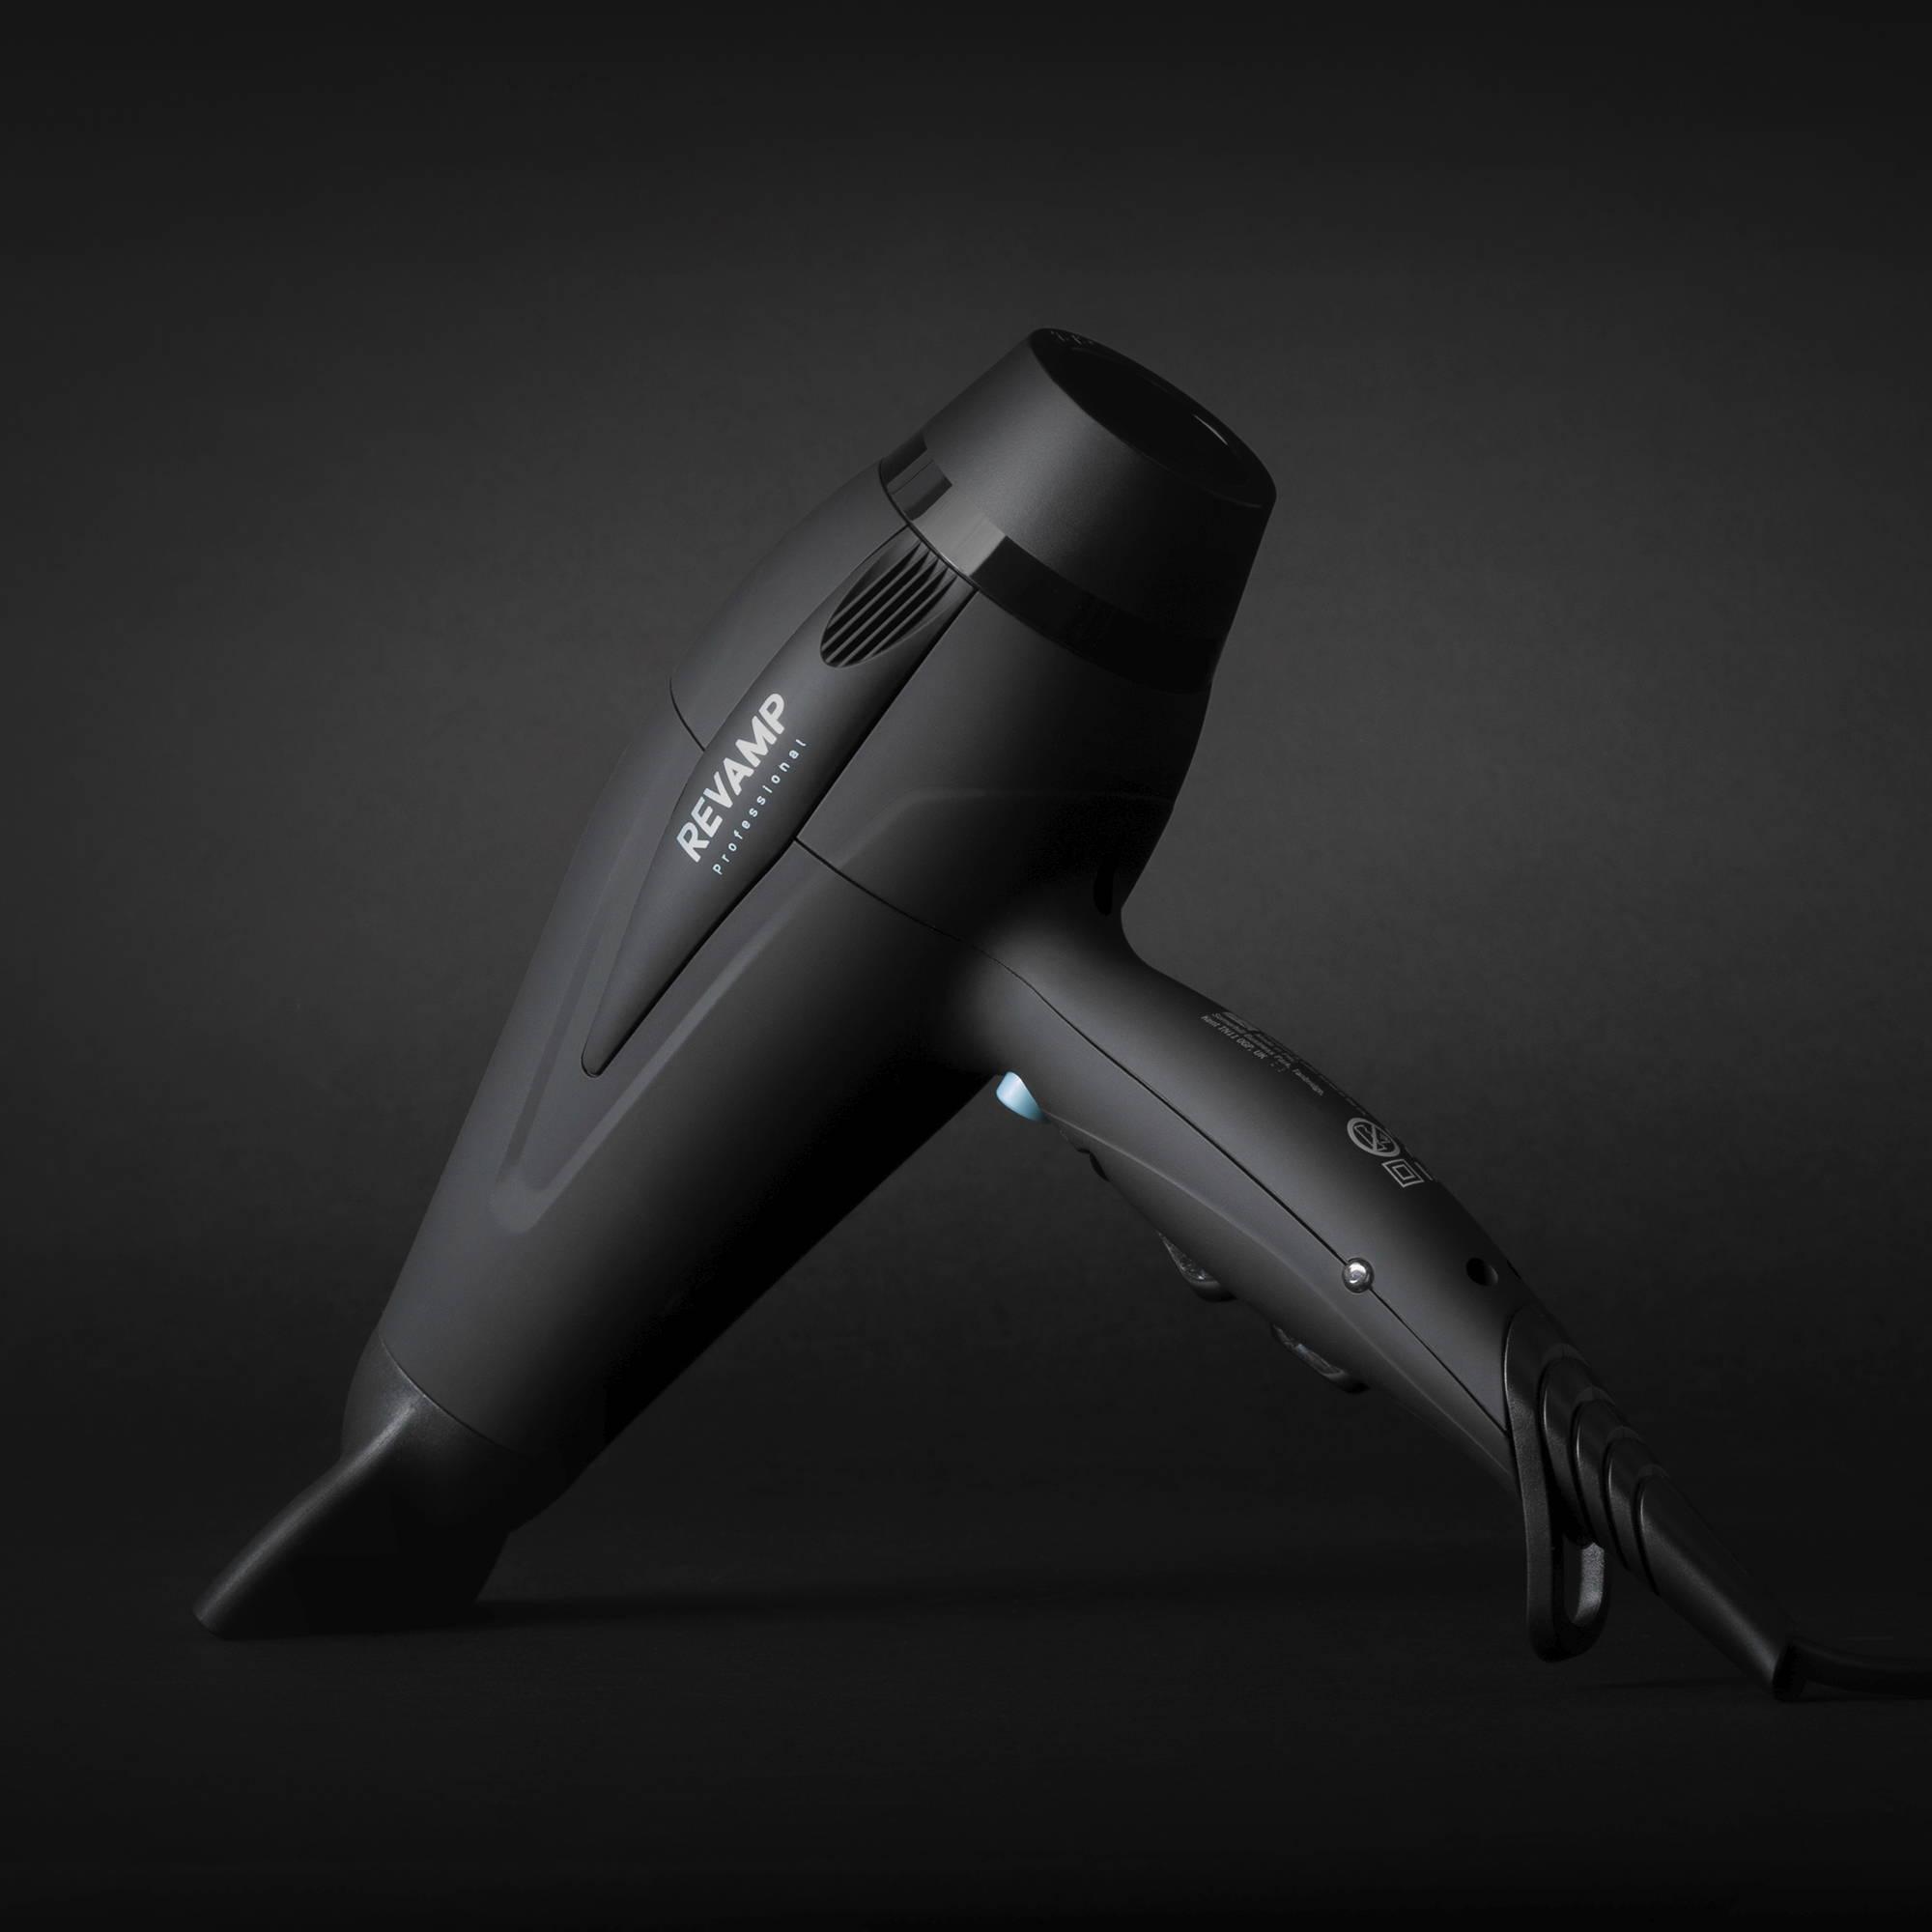 Progloss 5500 Ionic Hair Dryer